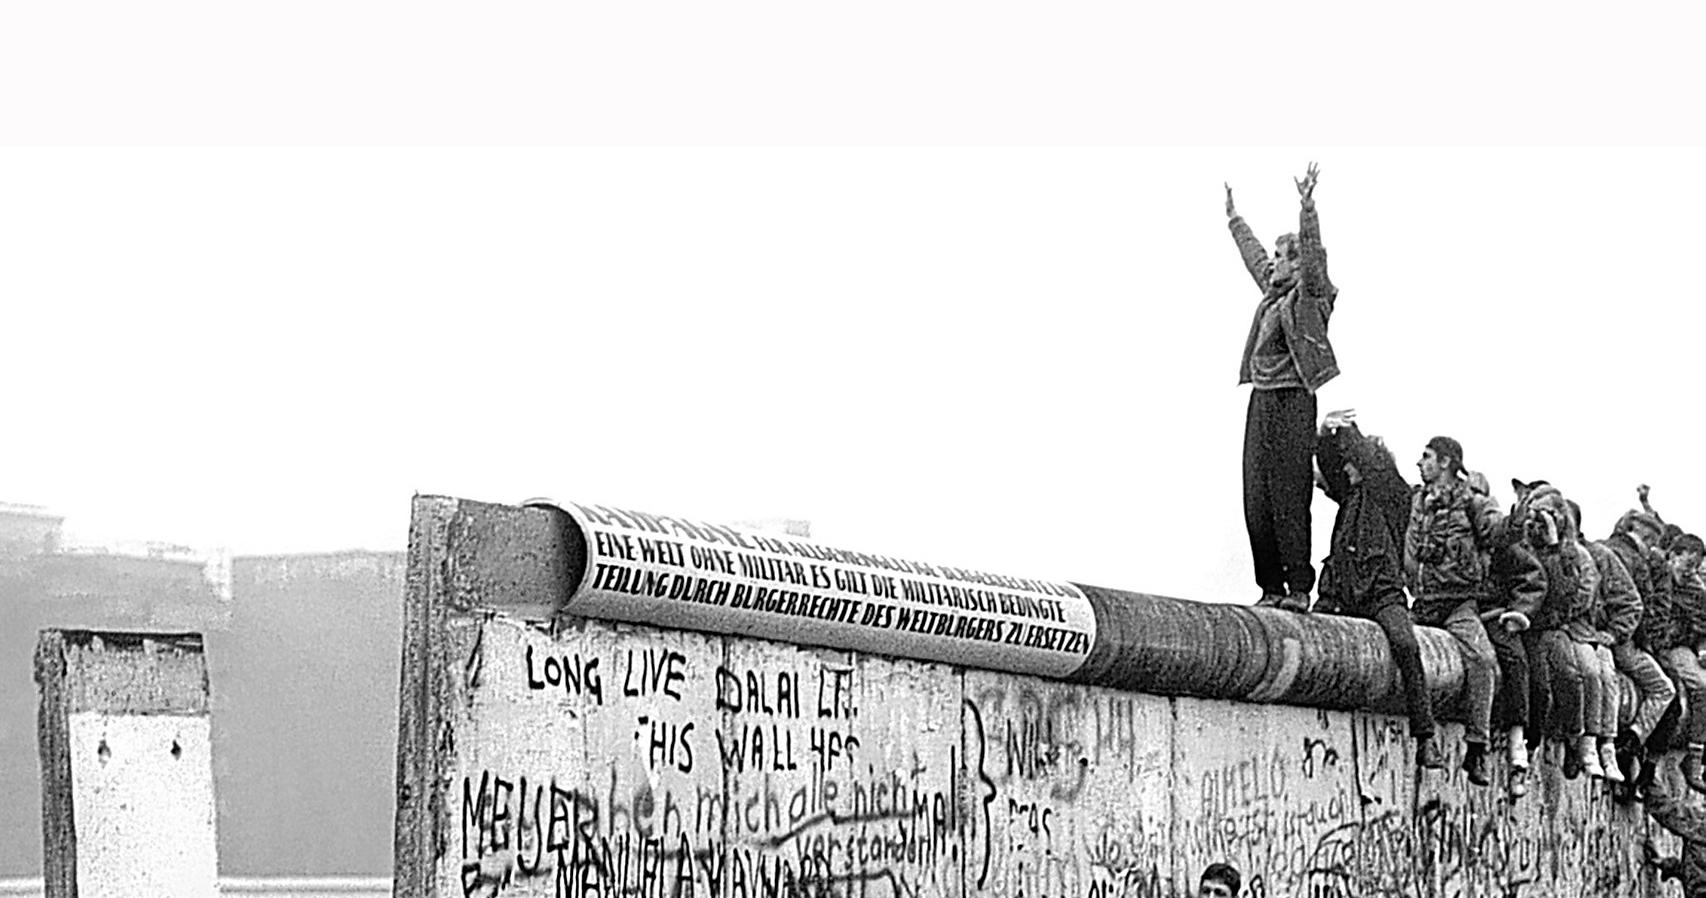 Protestors on Top of Berlin Wall